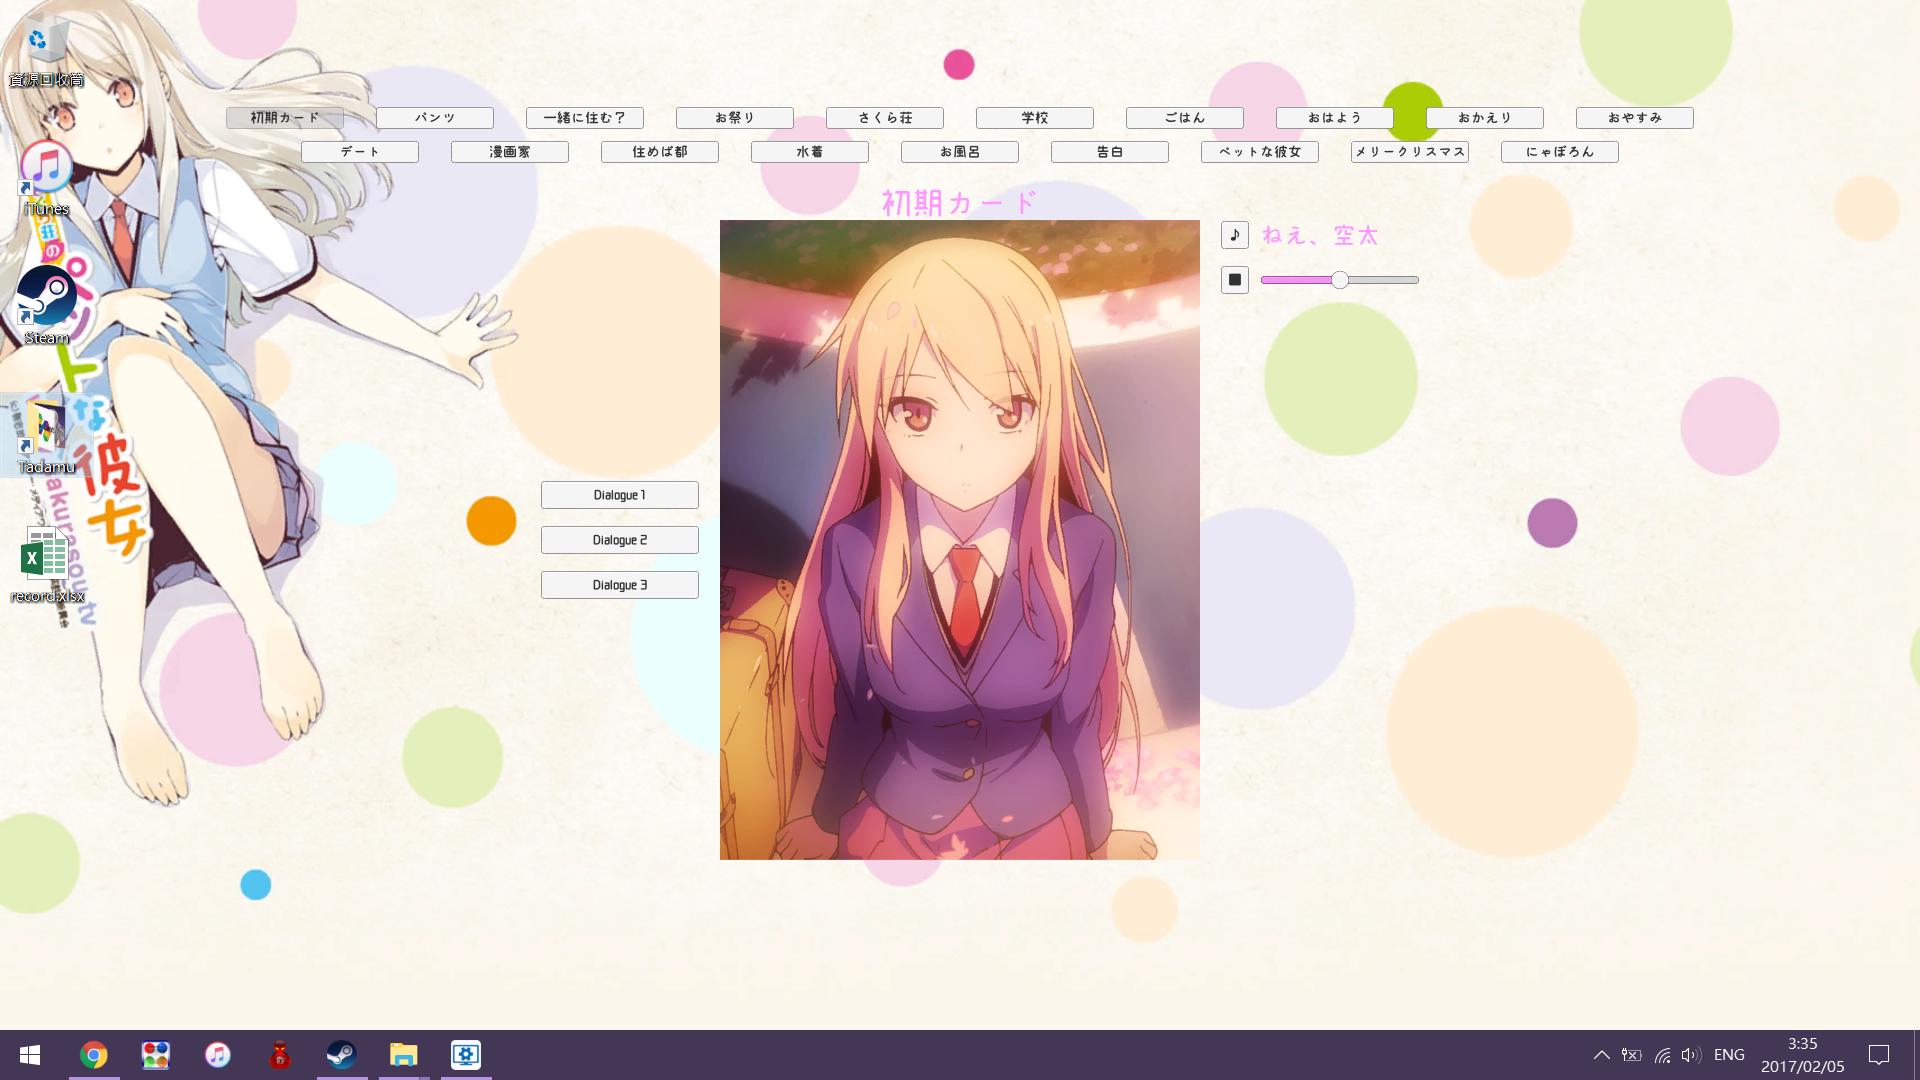 Steam ワークショップ Sakurasou Mashiro Interactive Wallpaper